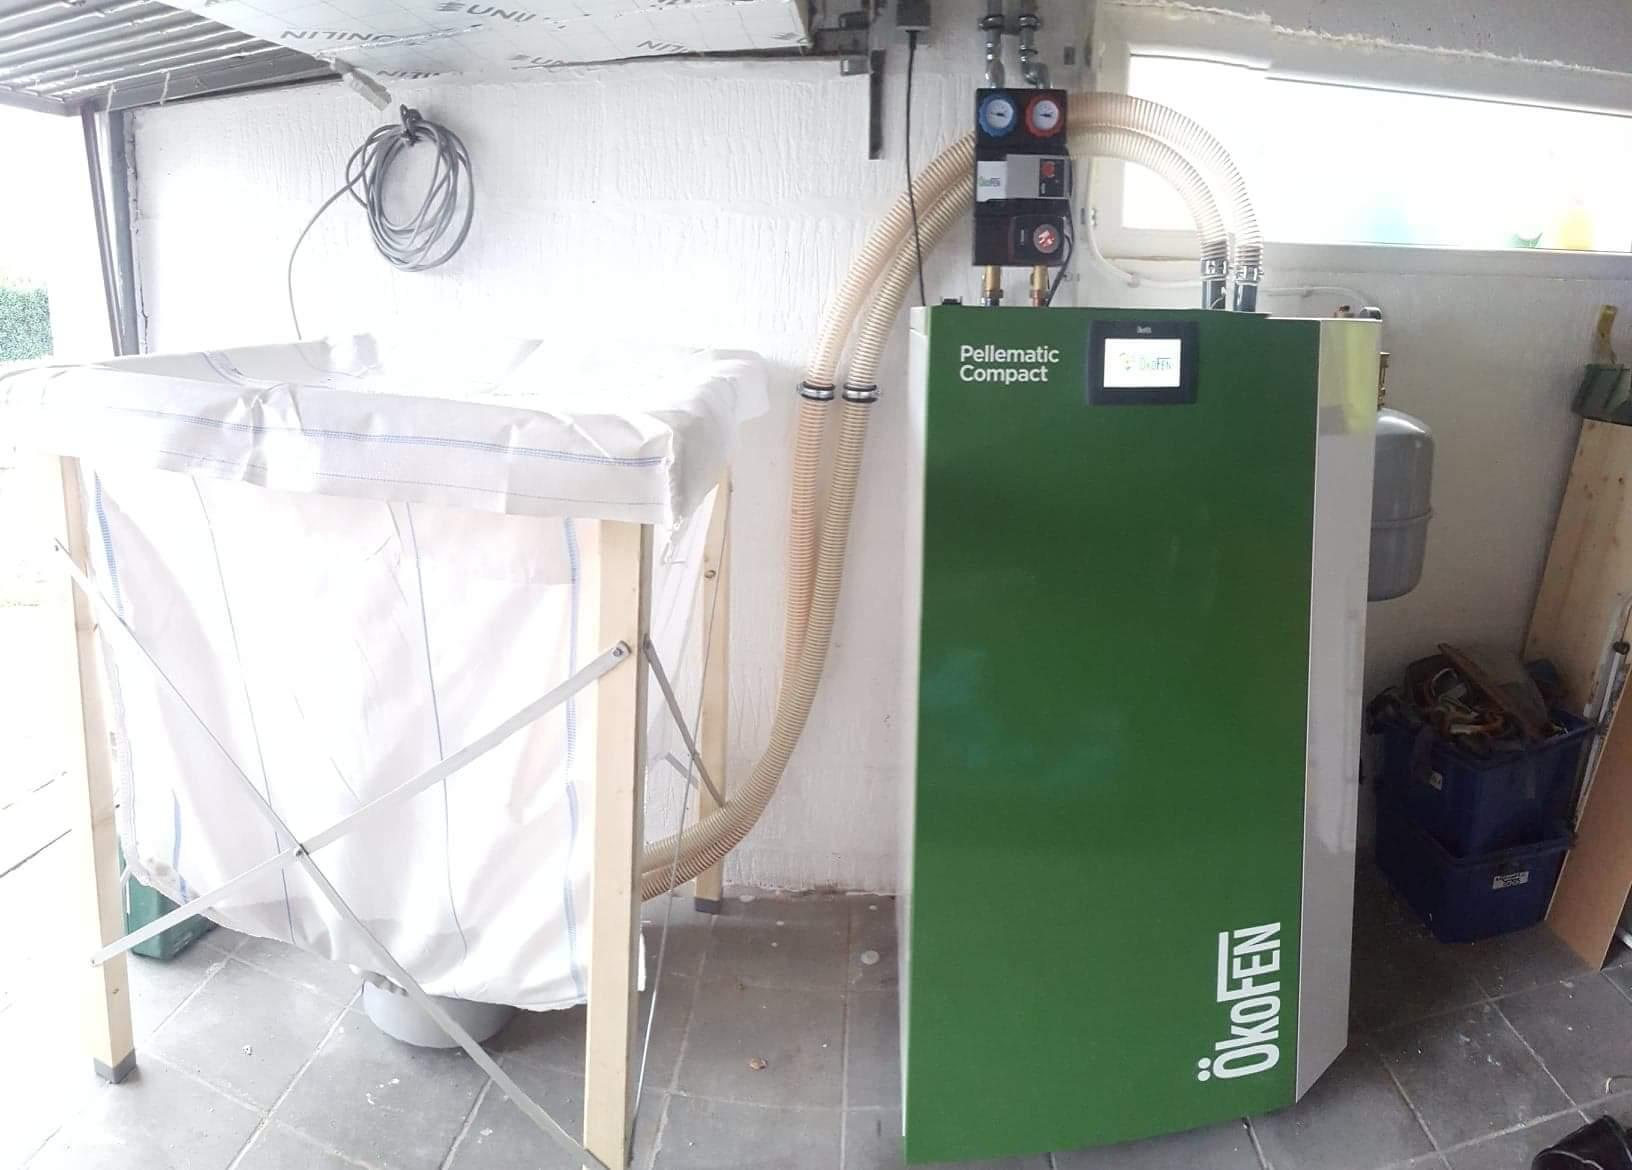 Delmelle Energies Okofen Compact avec silo textile